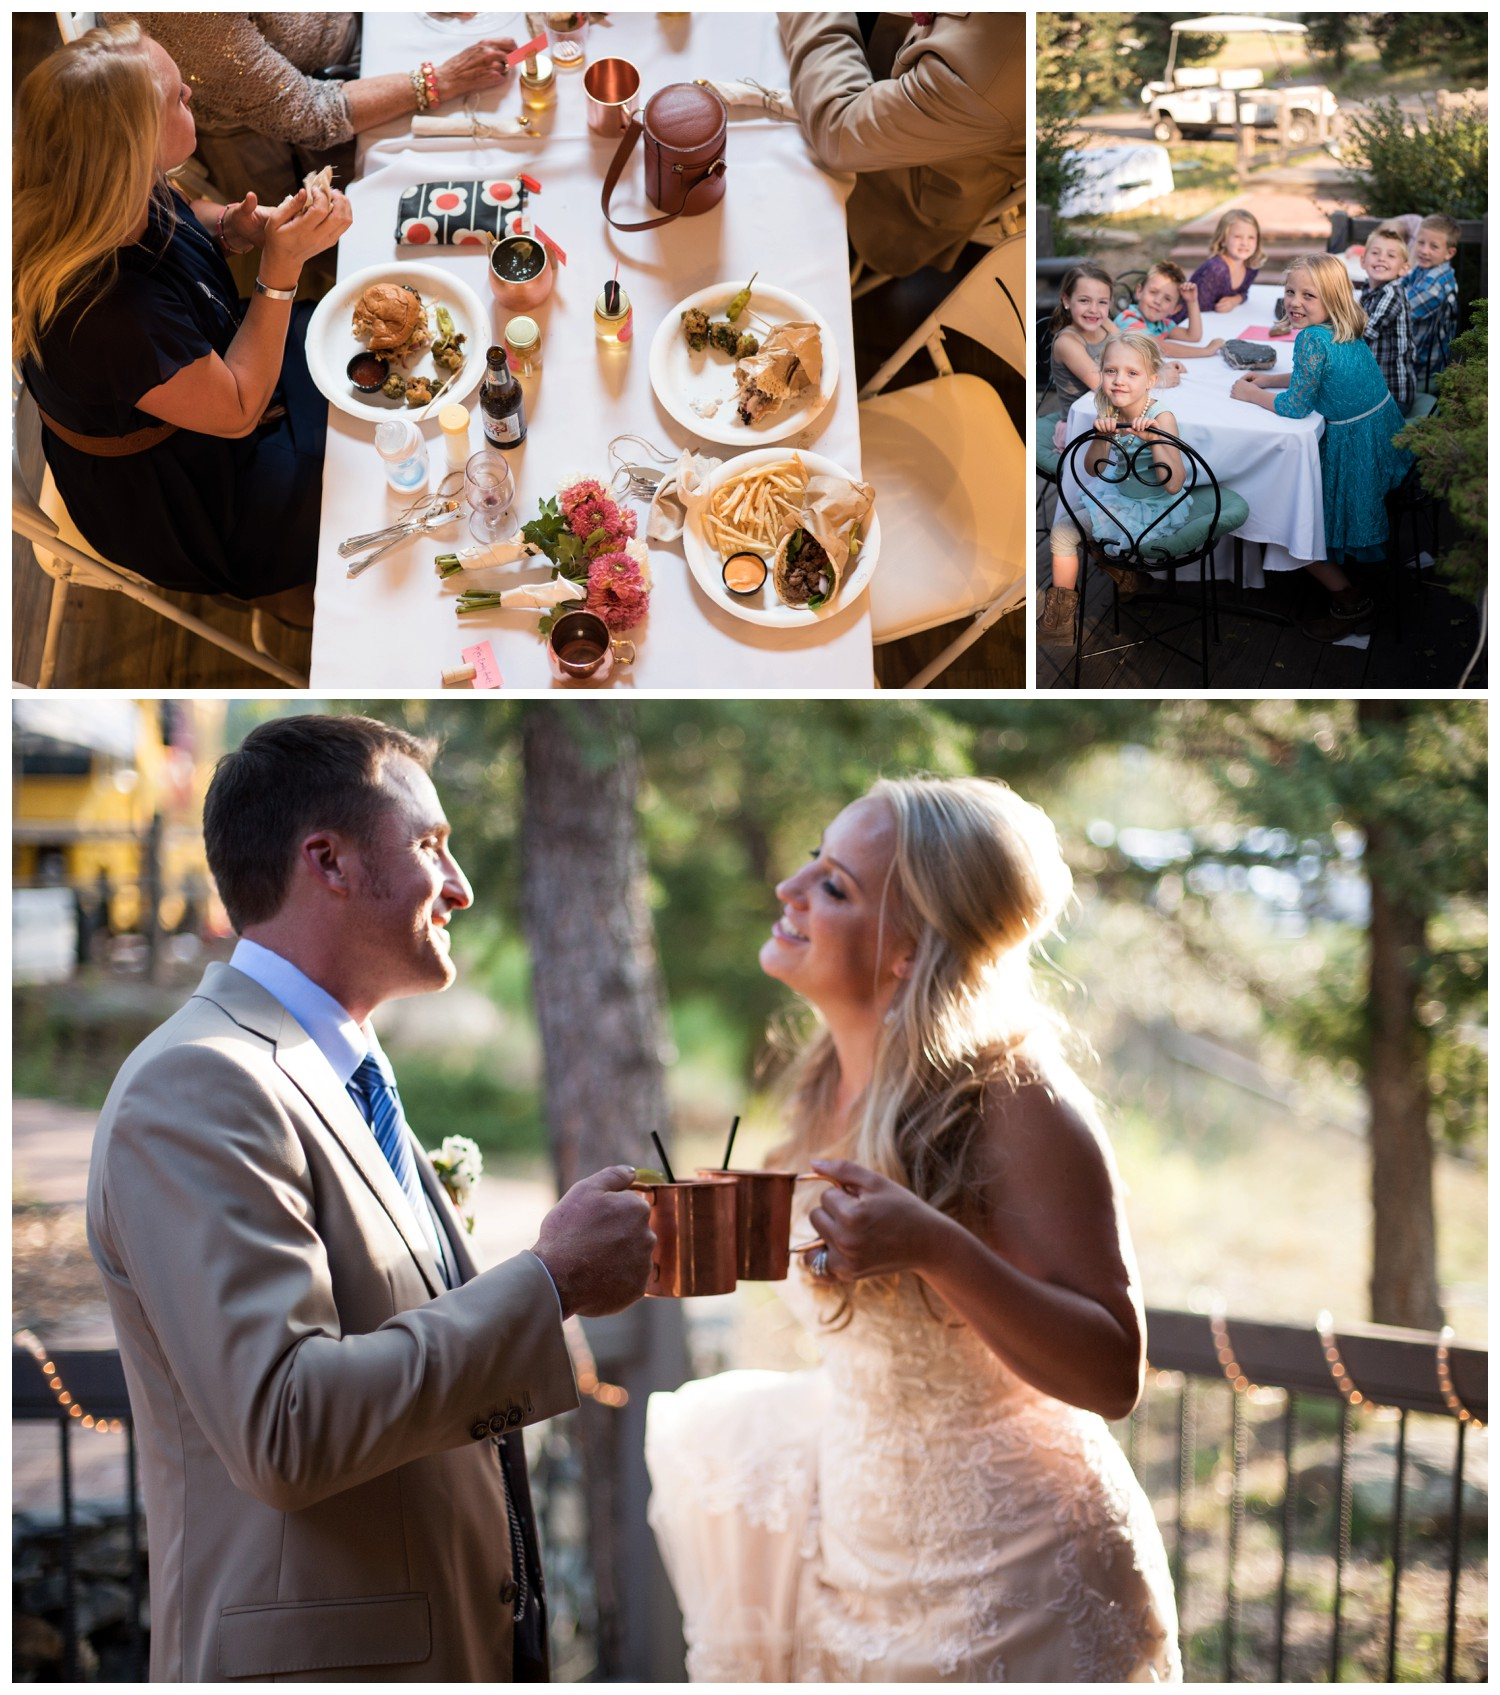 evergreen-colorado-wedding-photographer_0078.jpg